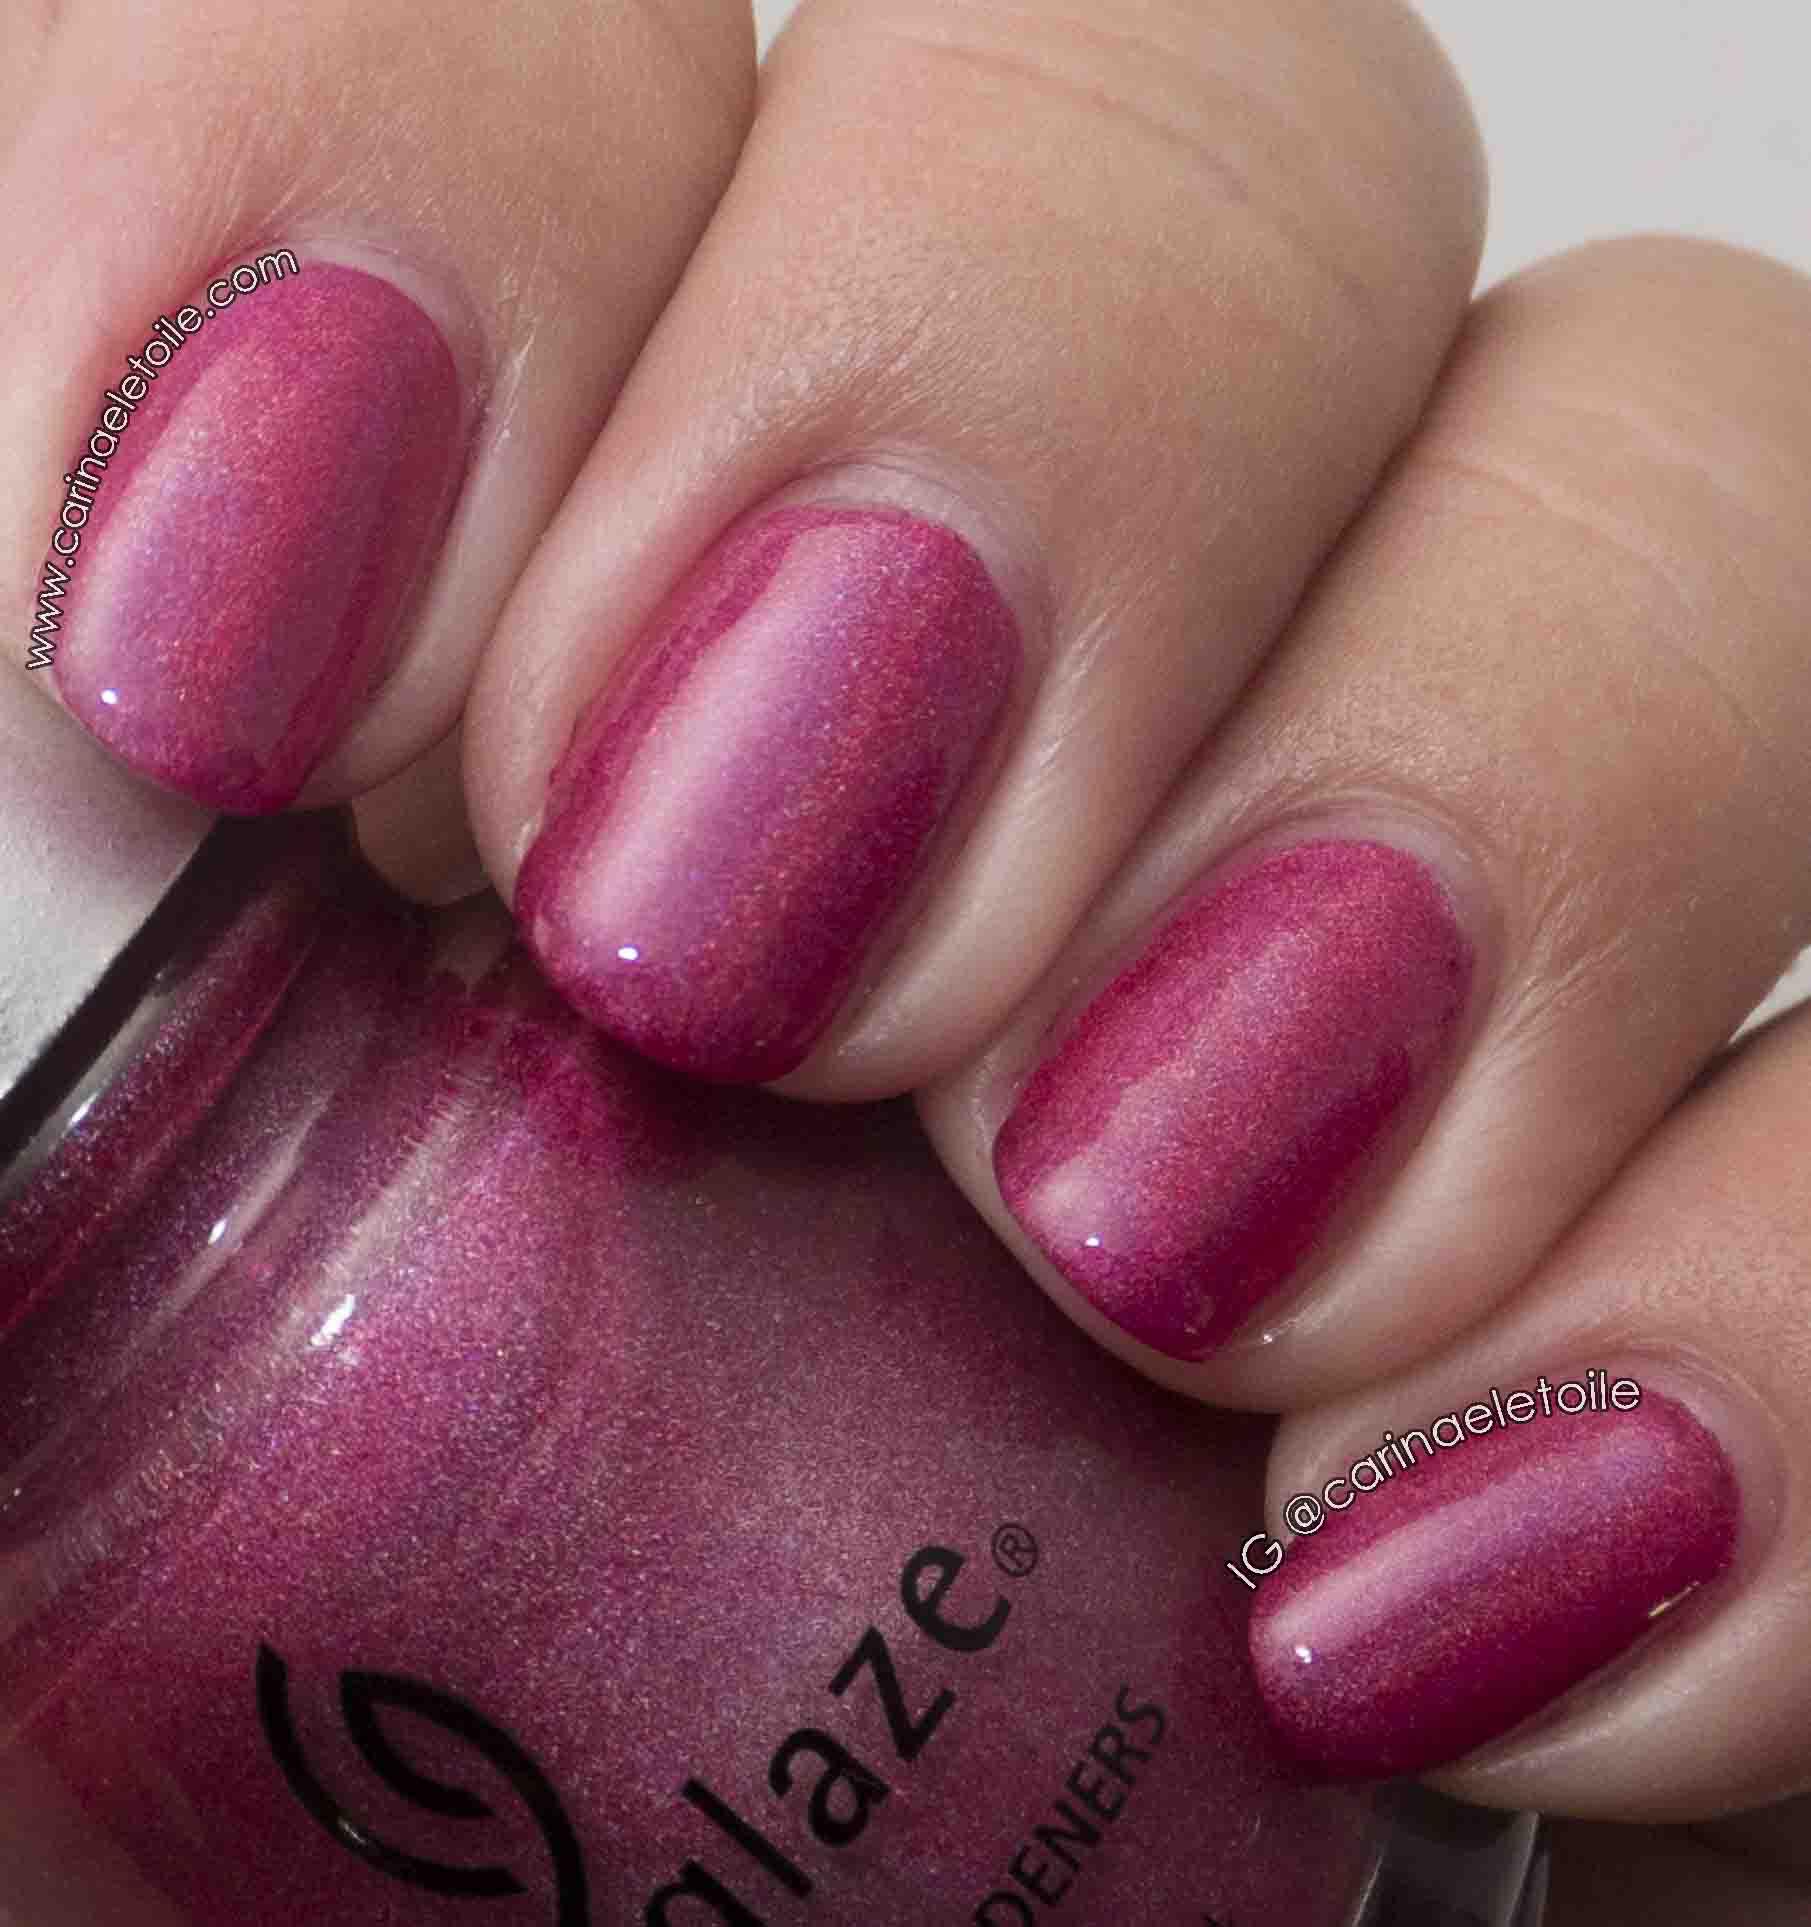 China Glaze OMG Collection | Carinae L\'etoile\'s polish stash